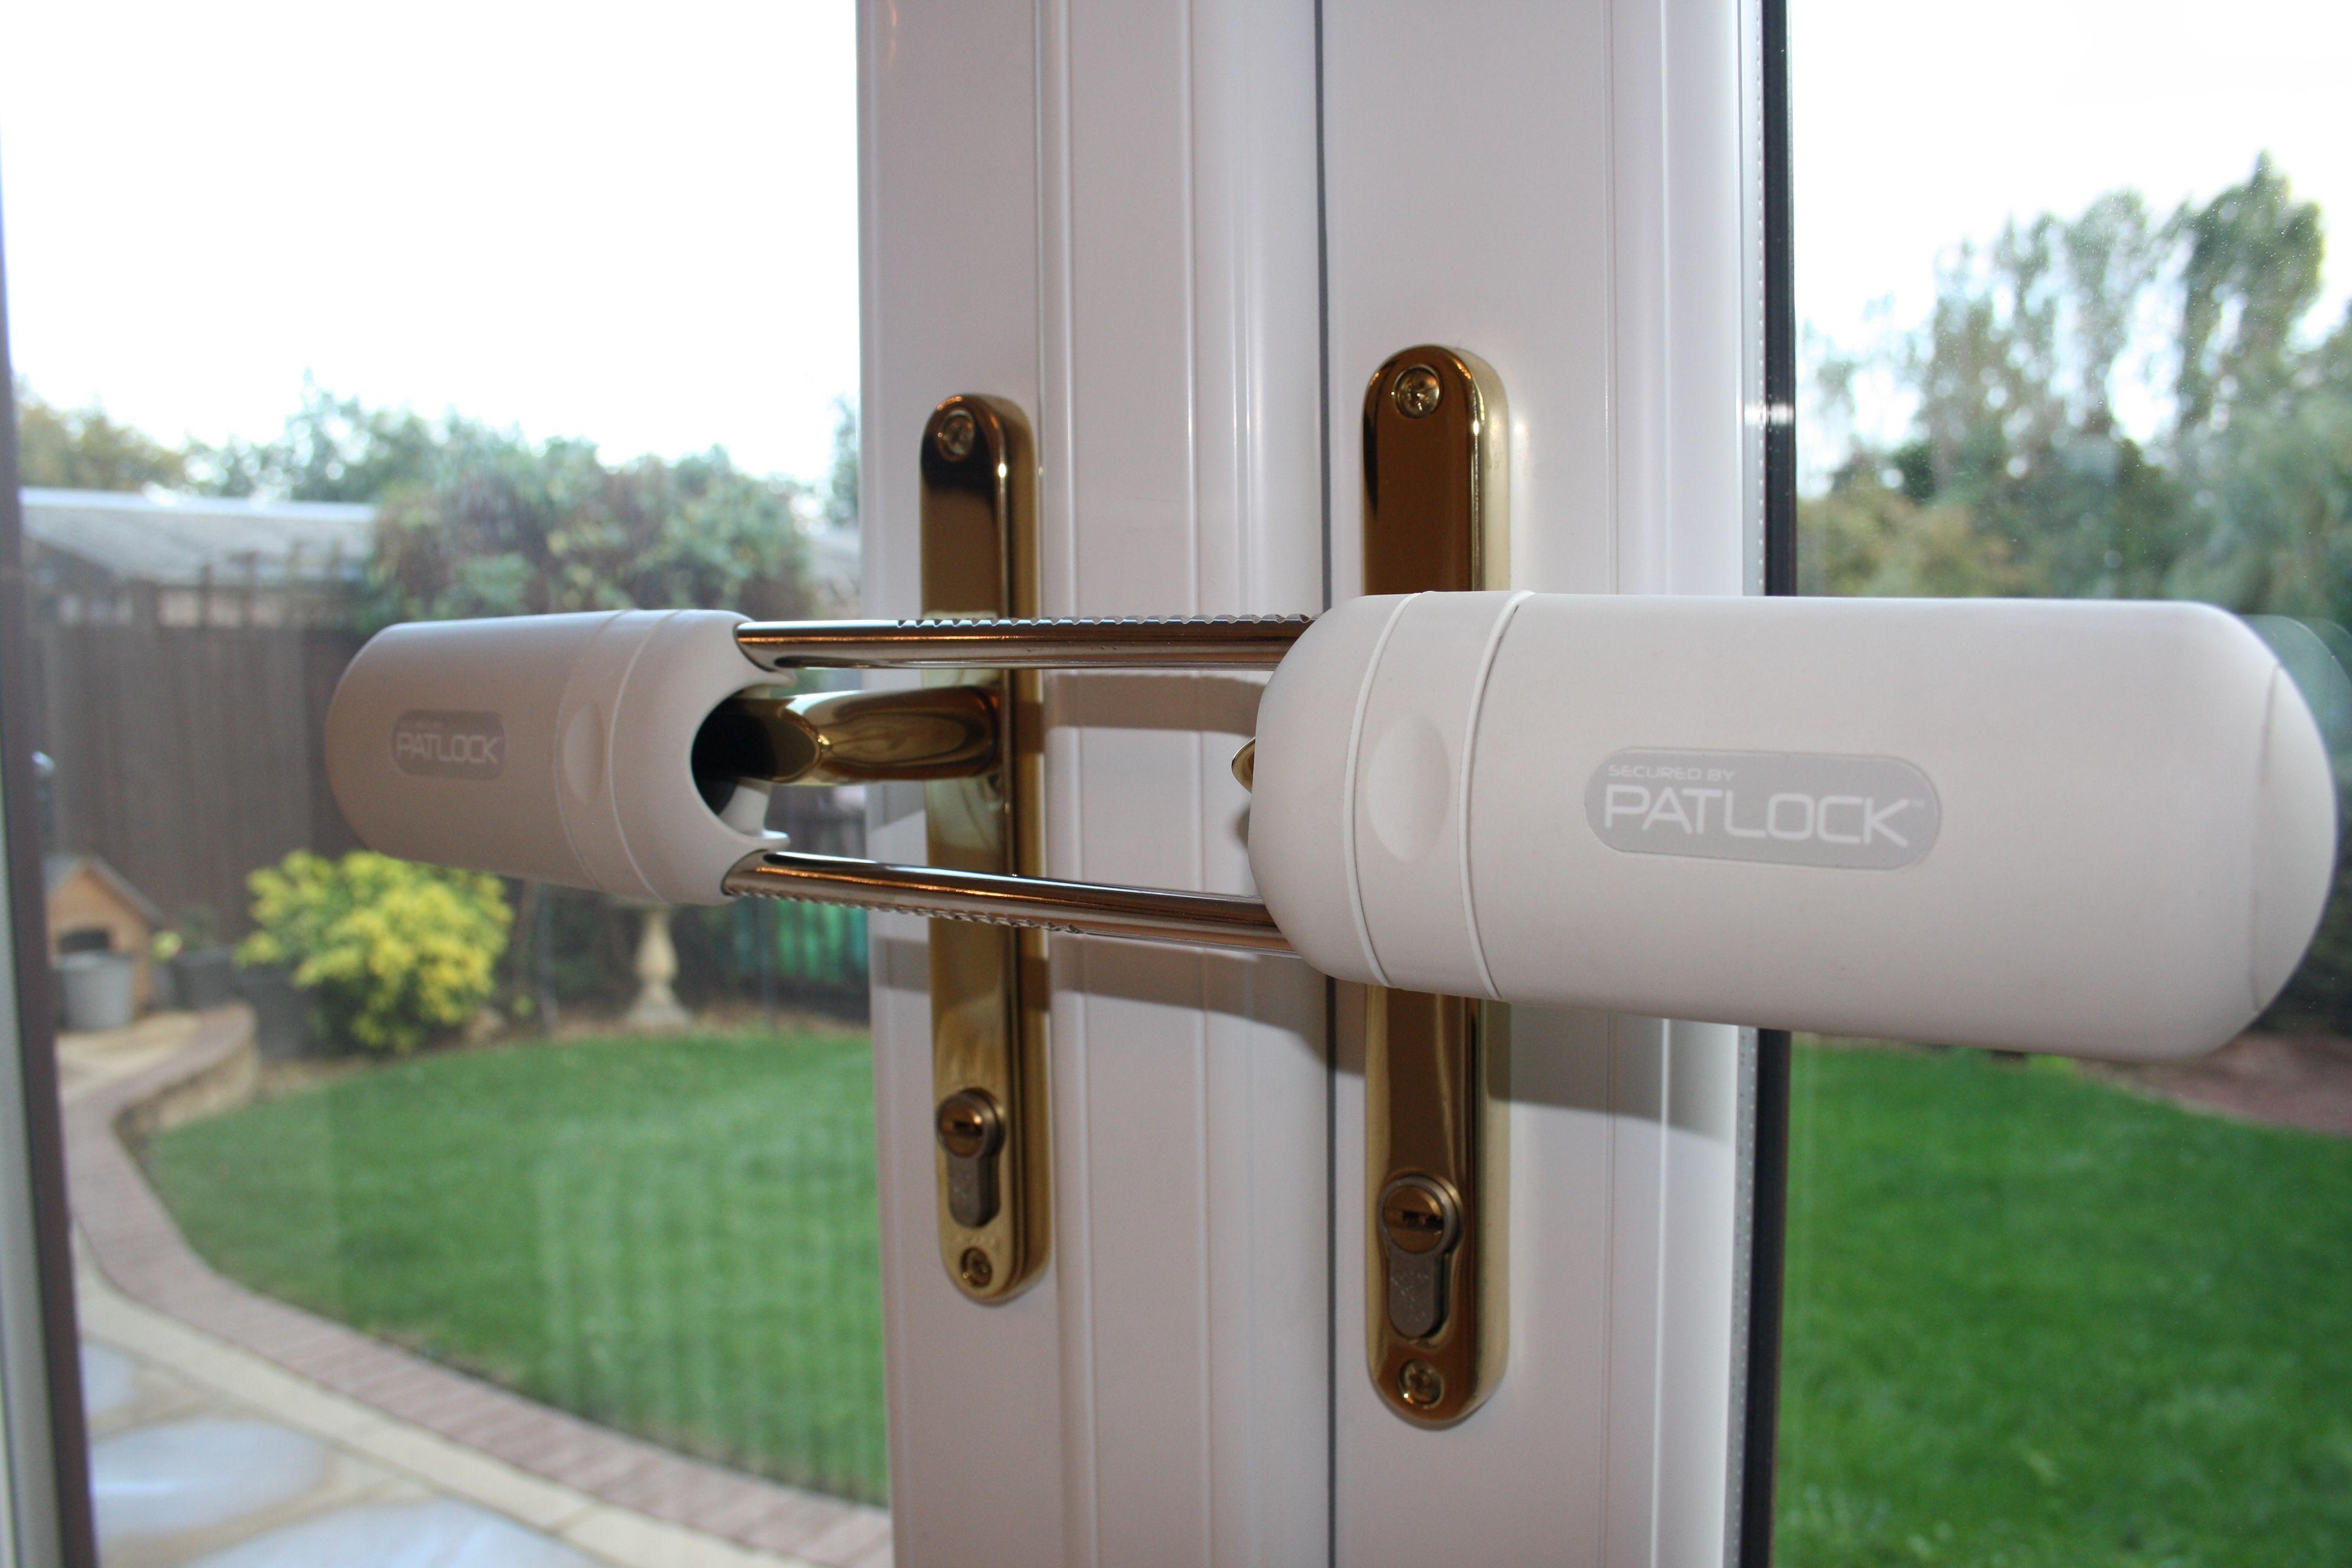 Extra Security Locks For Patio Doors